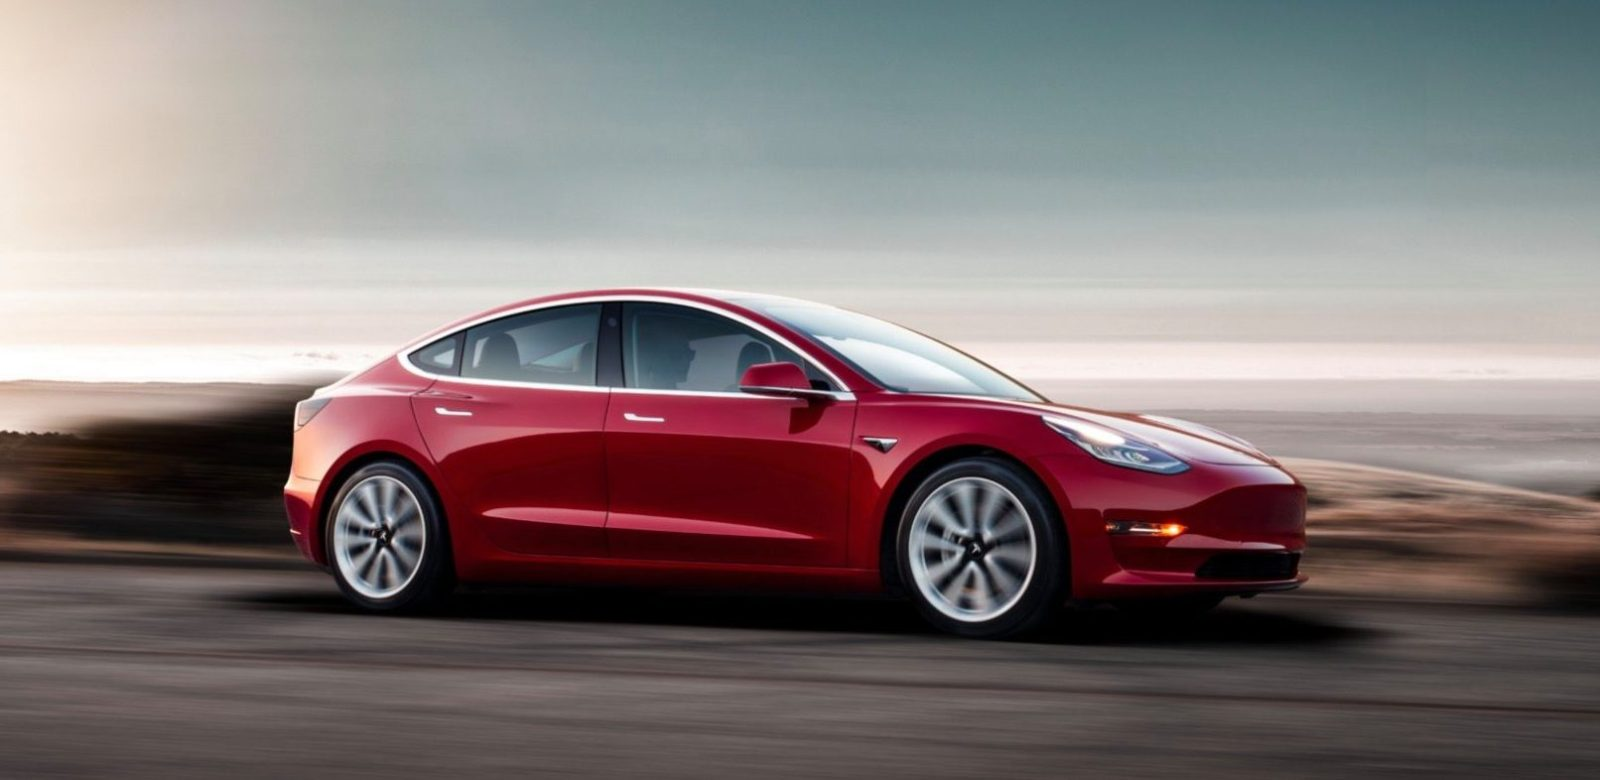 Tesla Model 3 on display